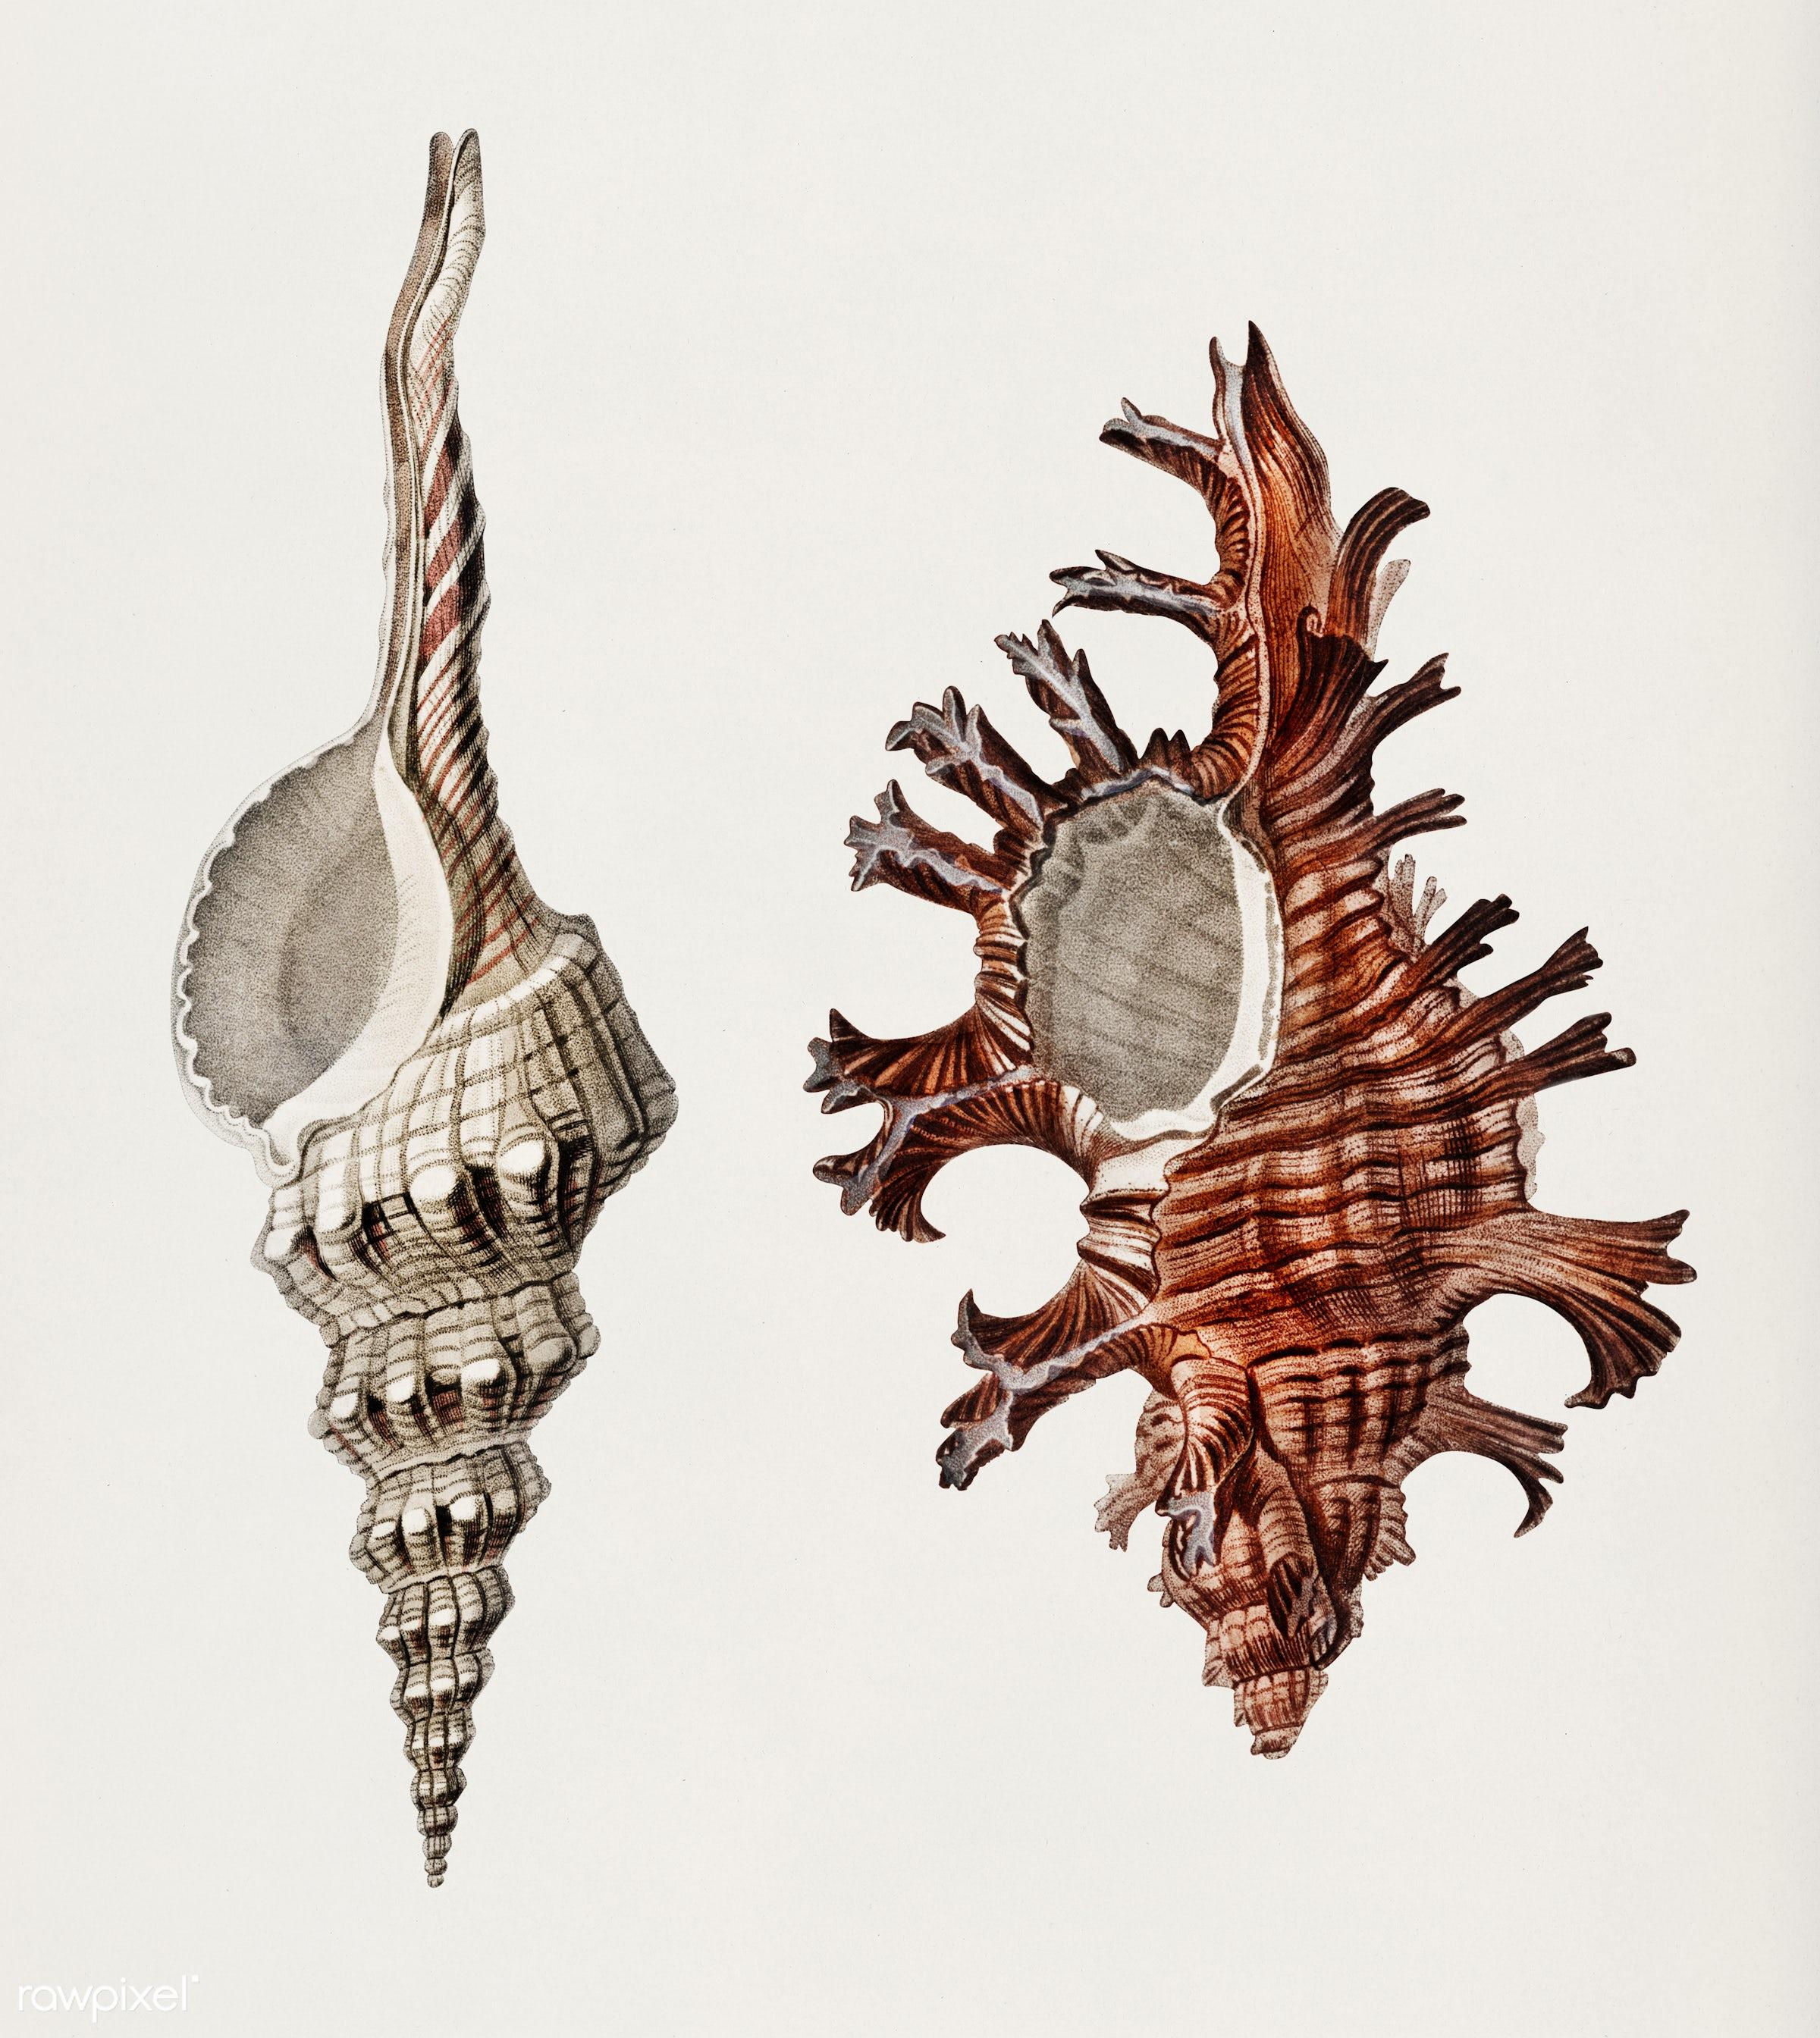 Fusus shells (Fusus longirostris) and Colorful murex (Murex palma rose) illustrated by Charles Dessalines D' Orbigny (...